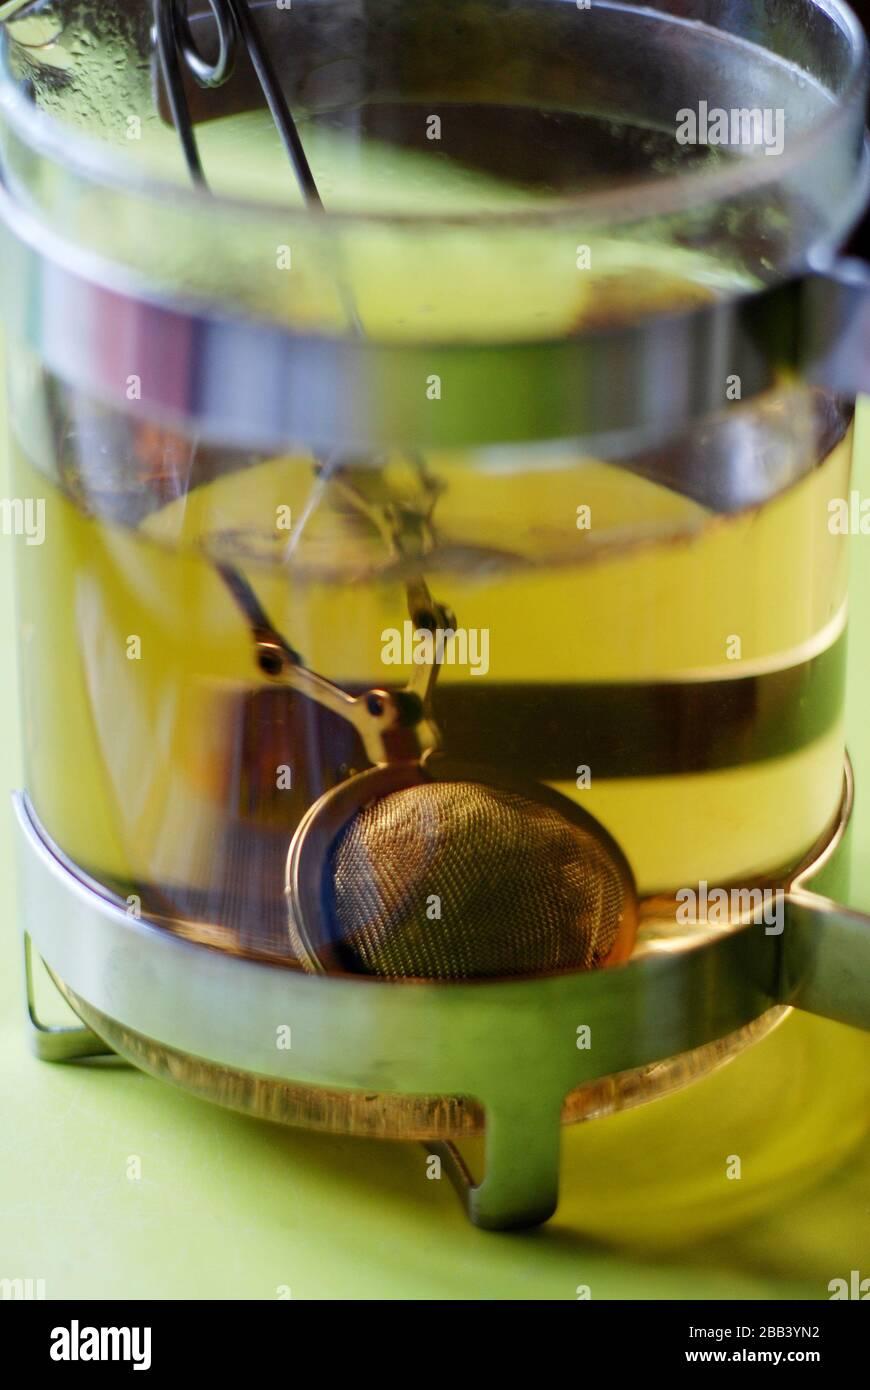 Tea sieve inside a glas to prepare a tea Stock Photo